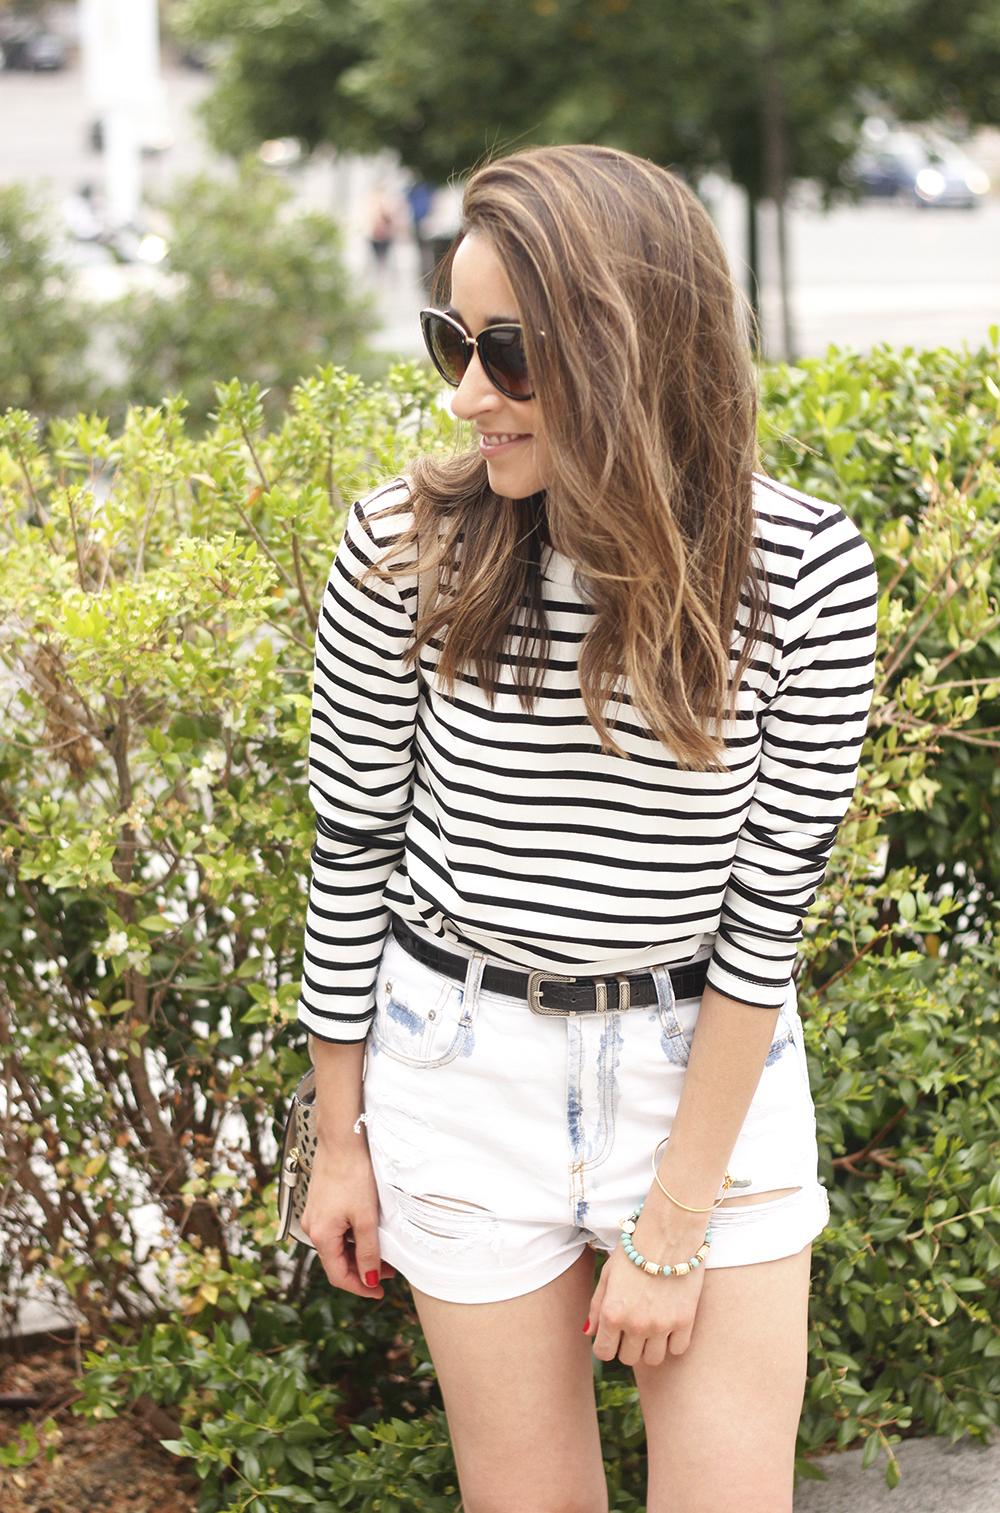 Stripes and denim shorts nude heels acosta bag sunnies belt summer outfit16